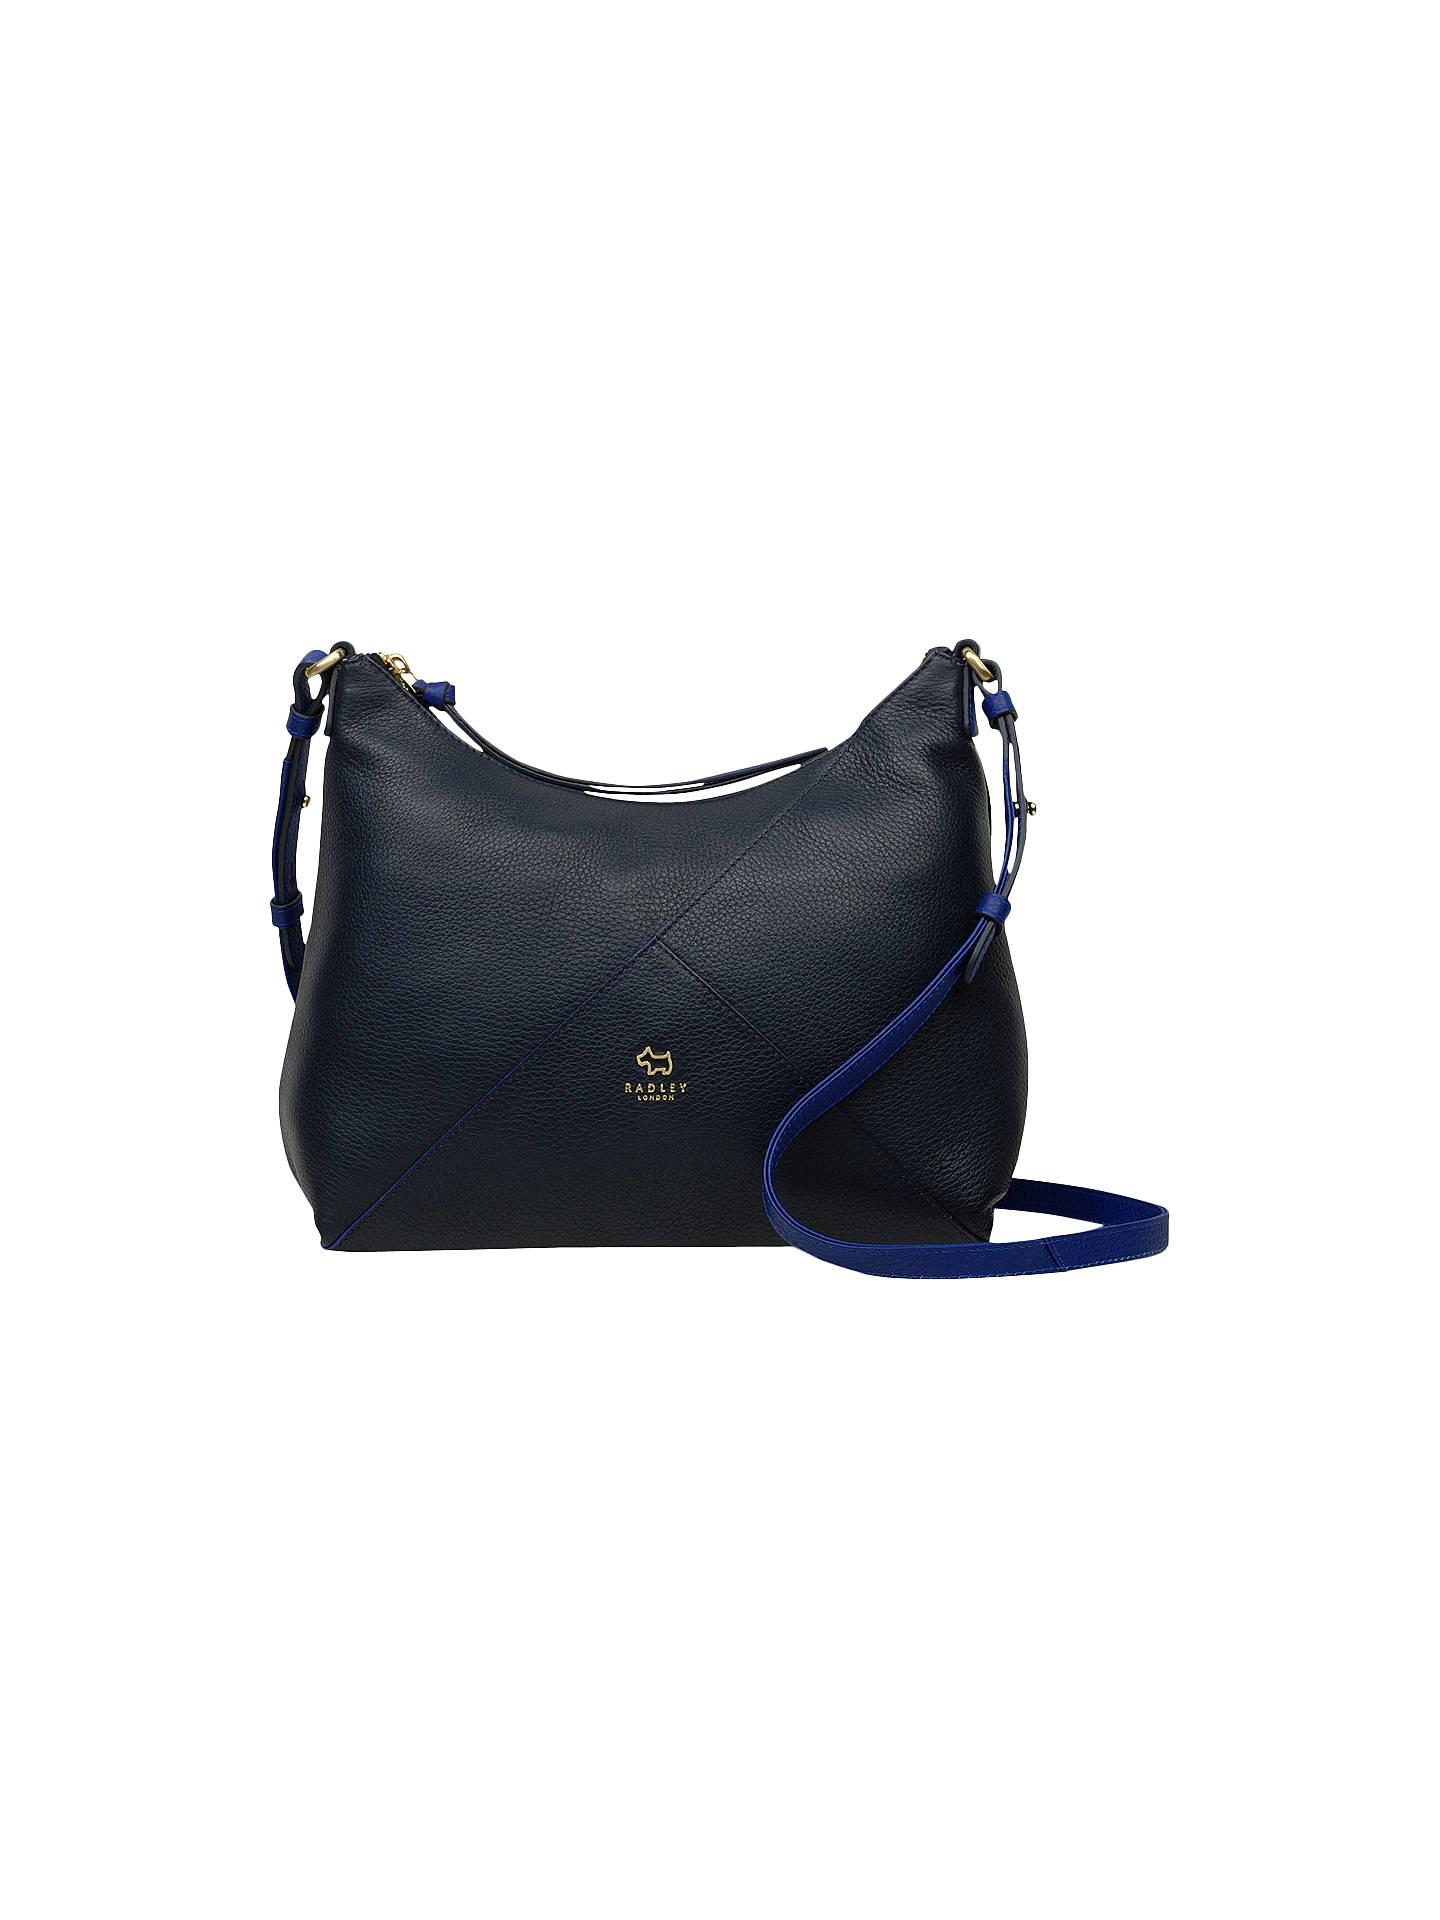 61f750a032c BuyRadley Oxleas Medium Leather Ziptop Cross Body Bag, Blue Online at  johnlewis.com ...